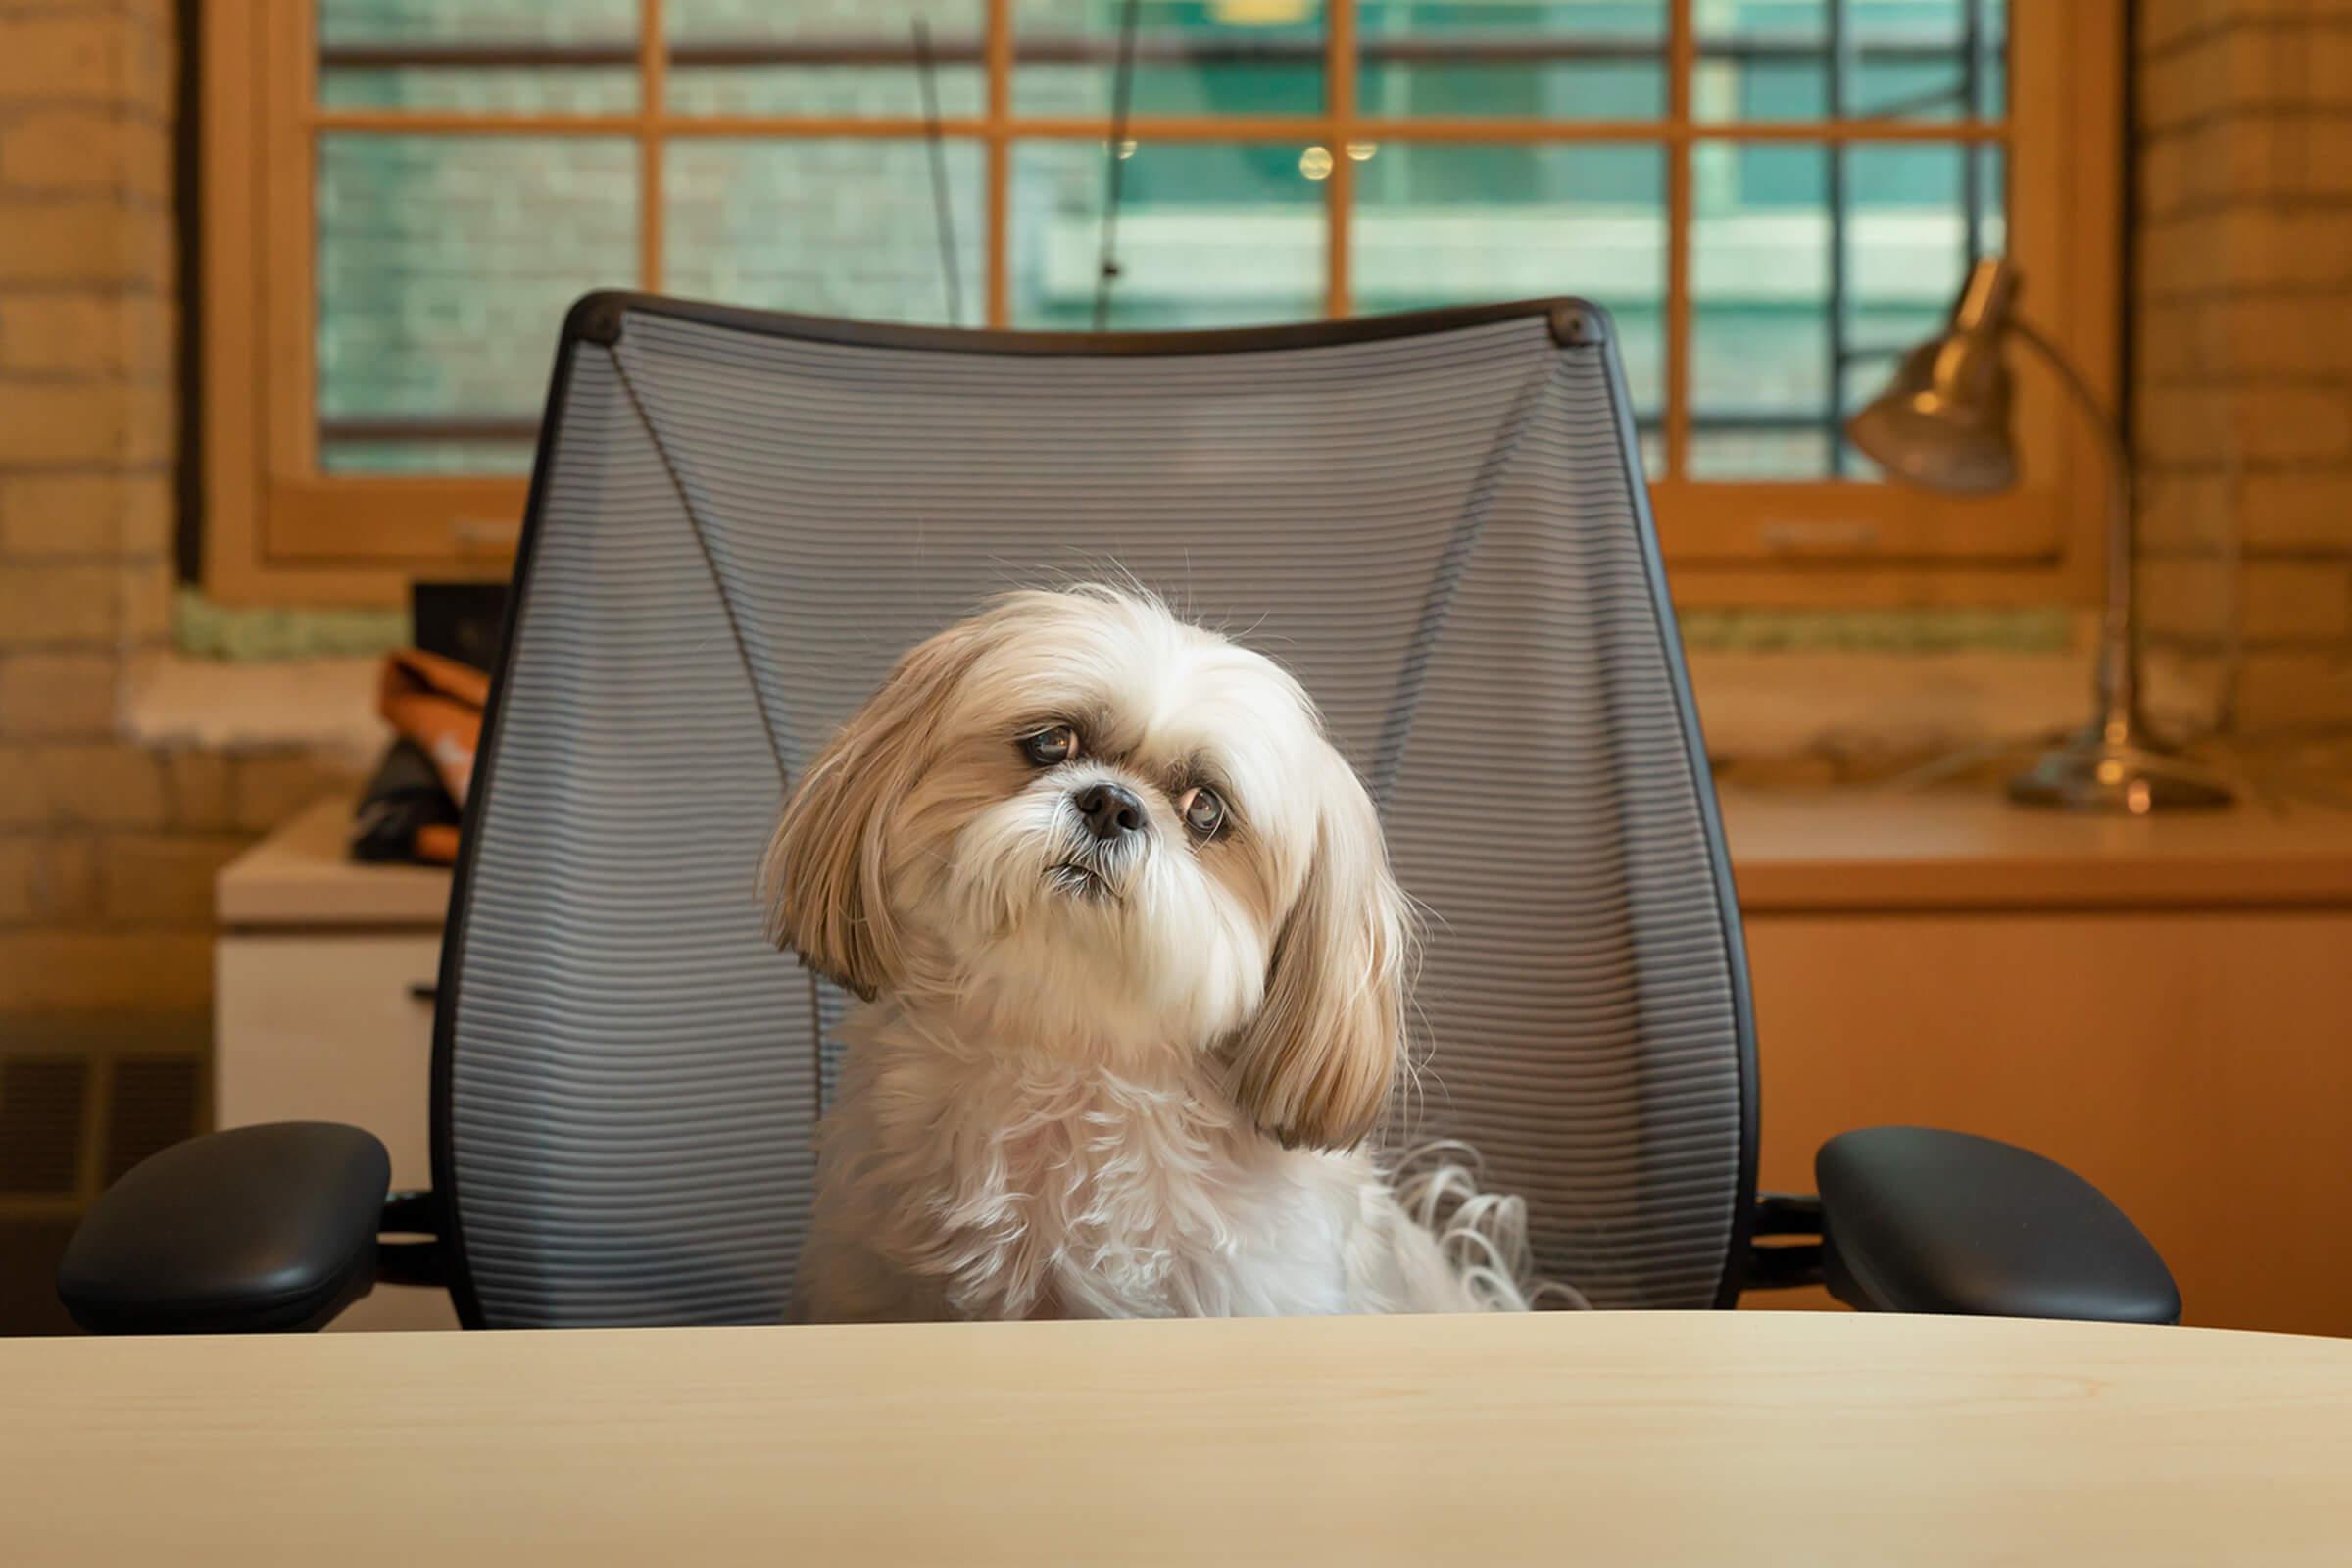 Shih Tzu dog in Toronto office